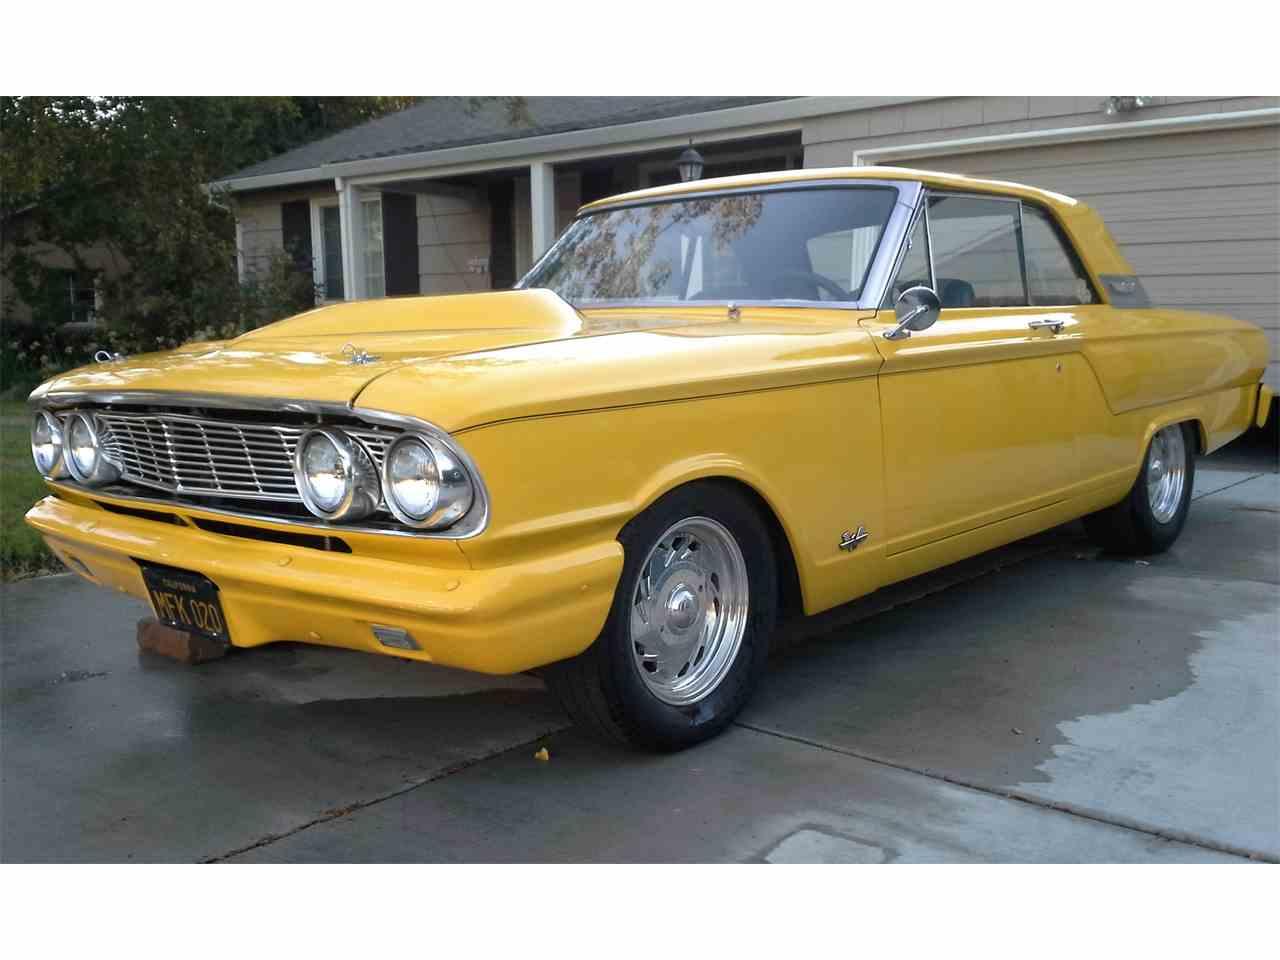 Sacramento Ford Dealers >> 1964 Ford Fairlane for Sale | ClassicCars.com | CC-642784